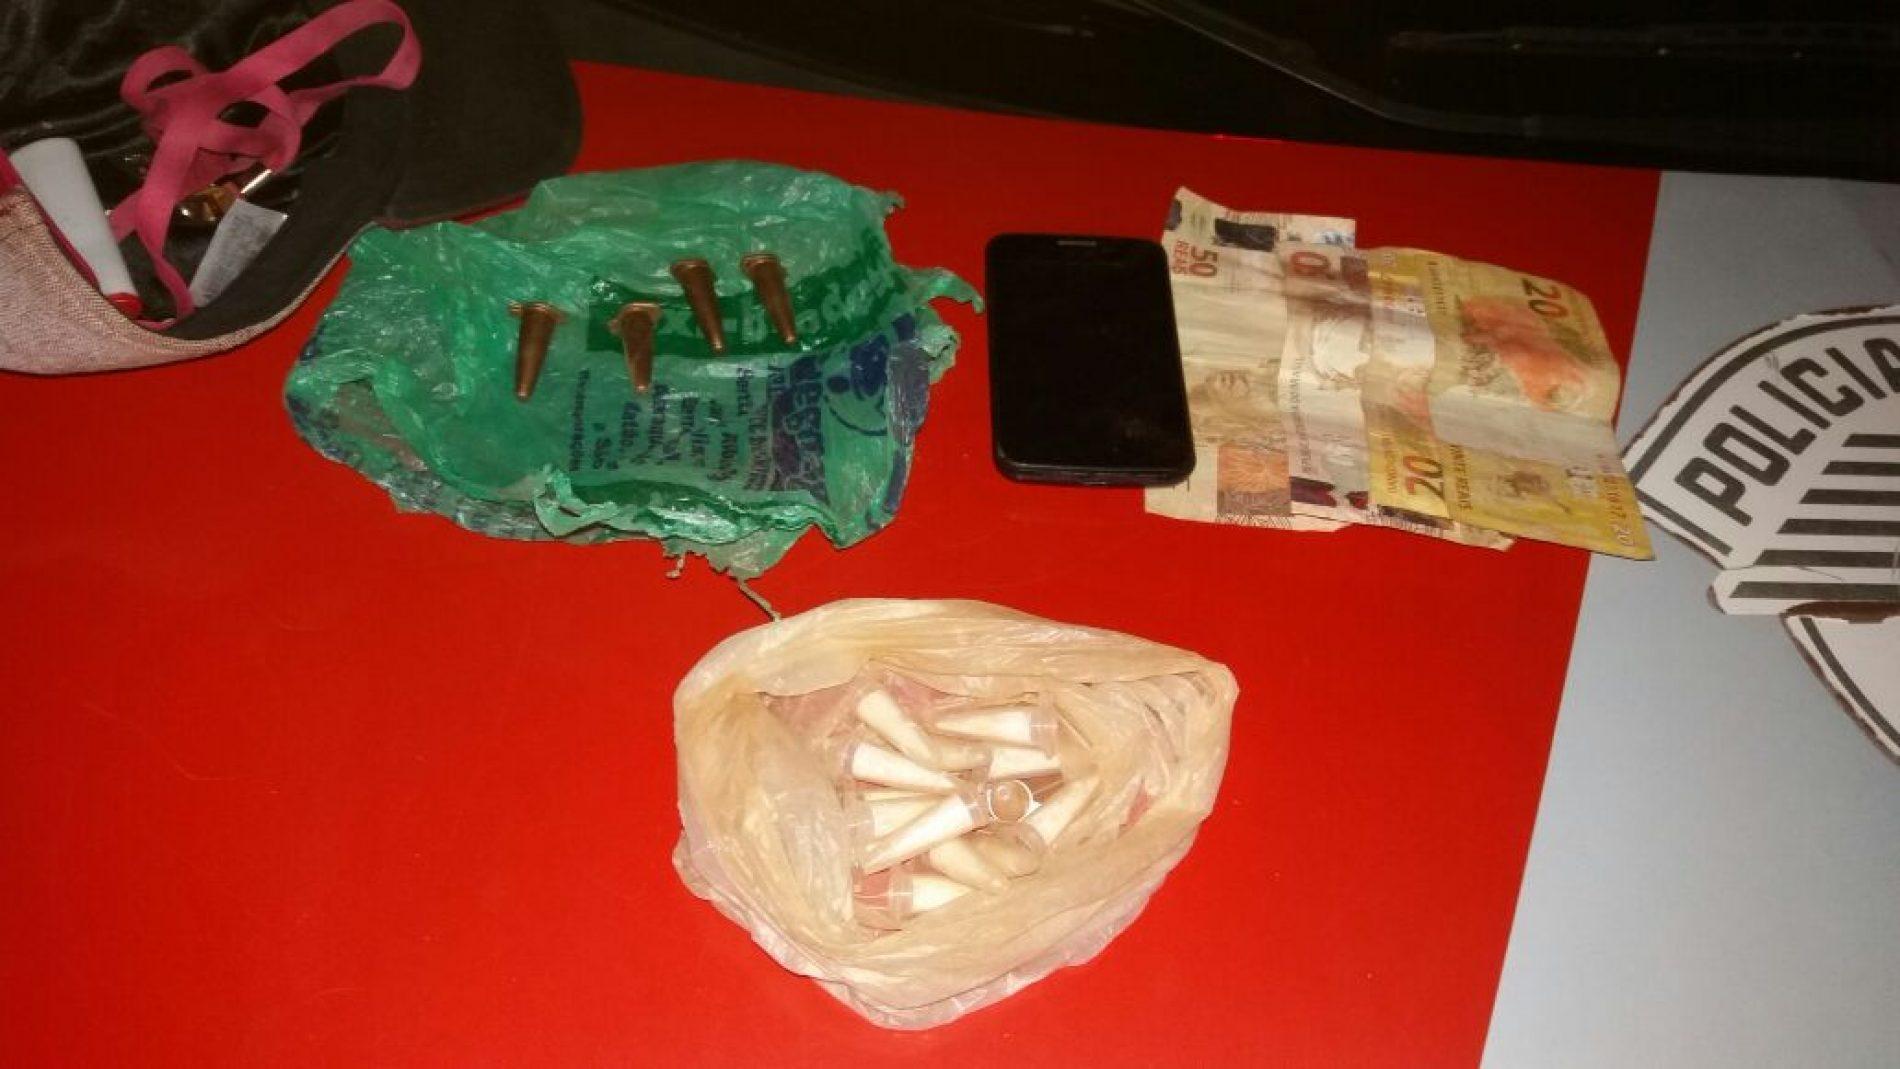 Equipe do Canil prende metalúrgico por tráfico de drogas no bairro Arizona